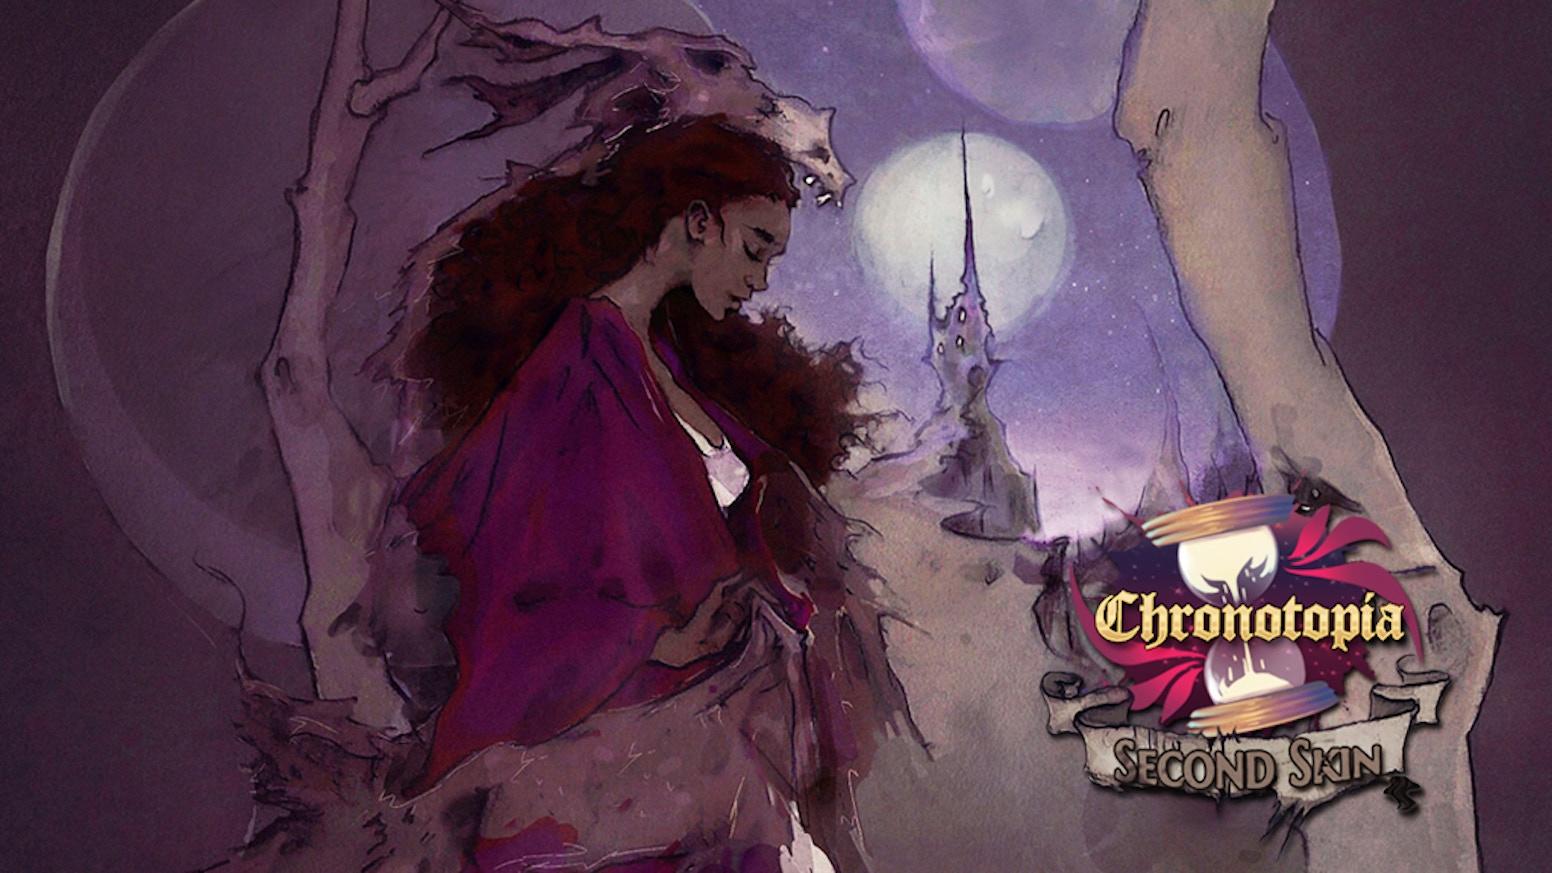 Chronotopia: Second Skin – Forgotten Fairytale Visual Novel